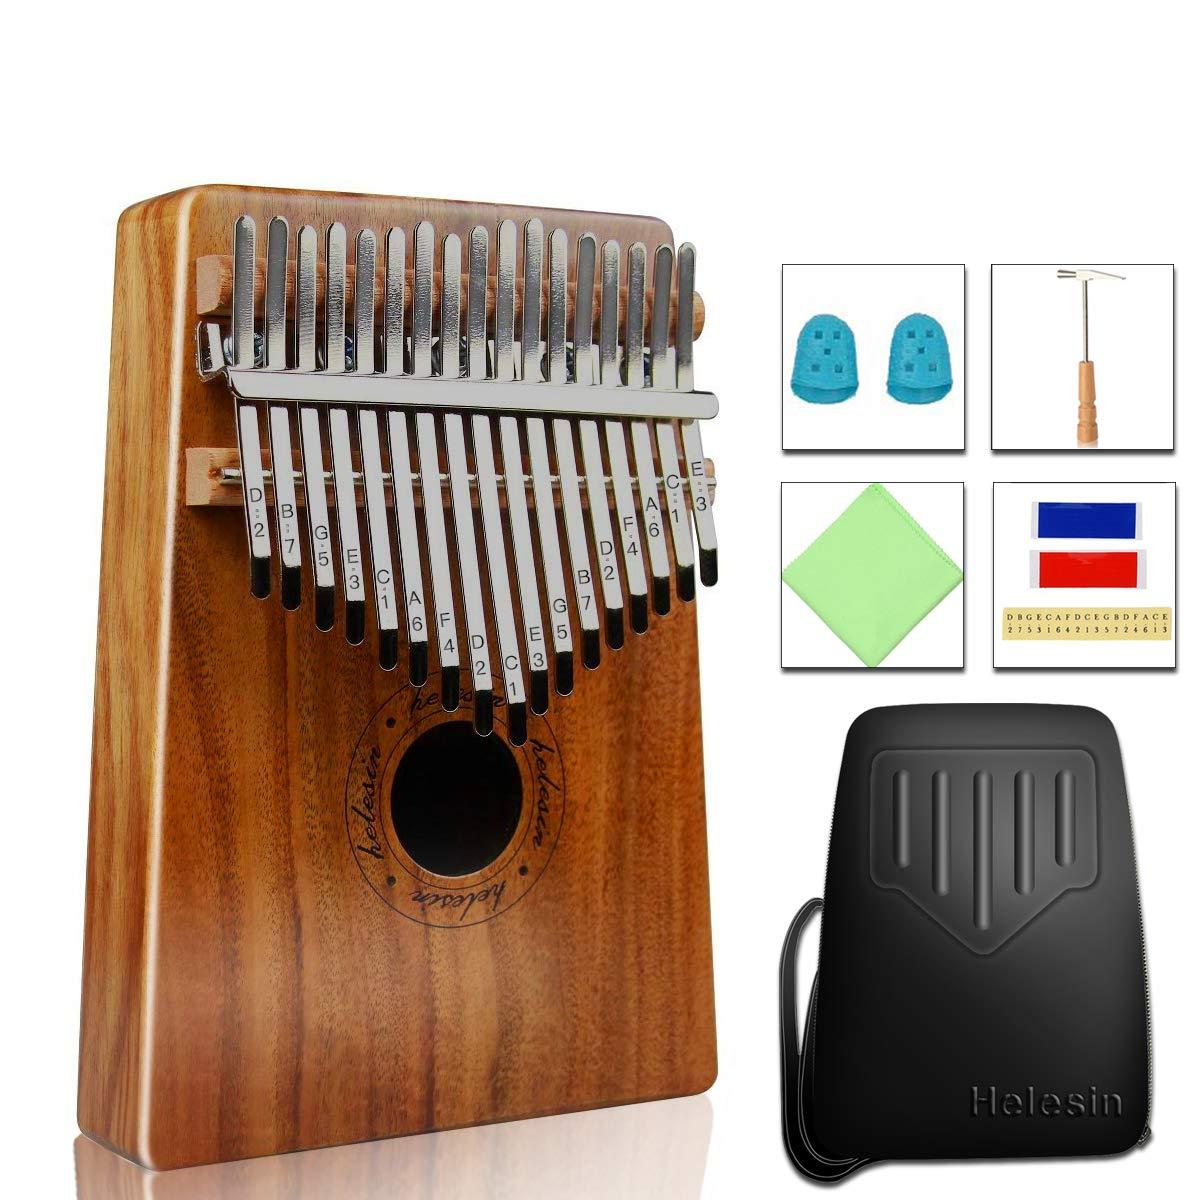 17 Keys Kalimba Thumb Piano, Professional KOA Mbira Protable Finger Piano with EVA Waterproof Hard Protective Case, Gift for Kids Adult Beginners by HELESIN